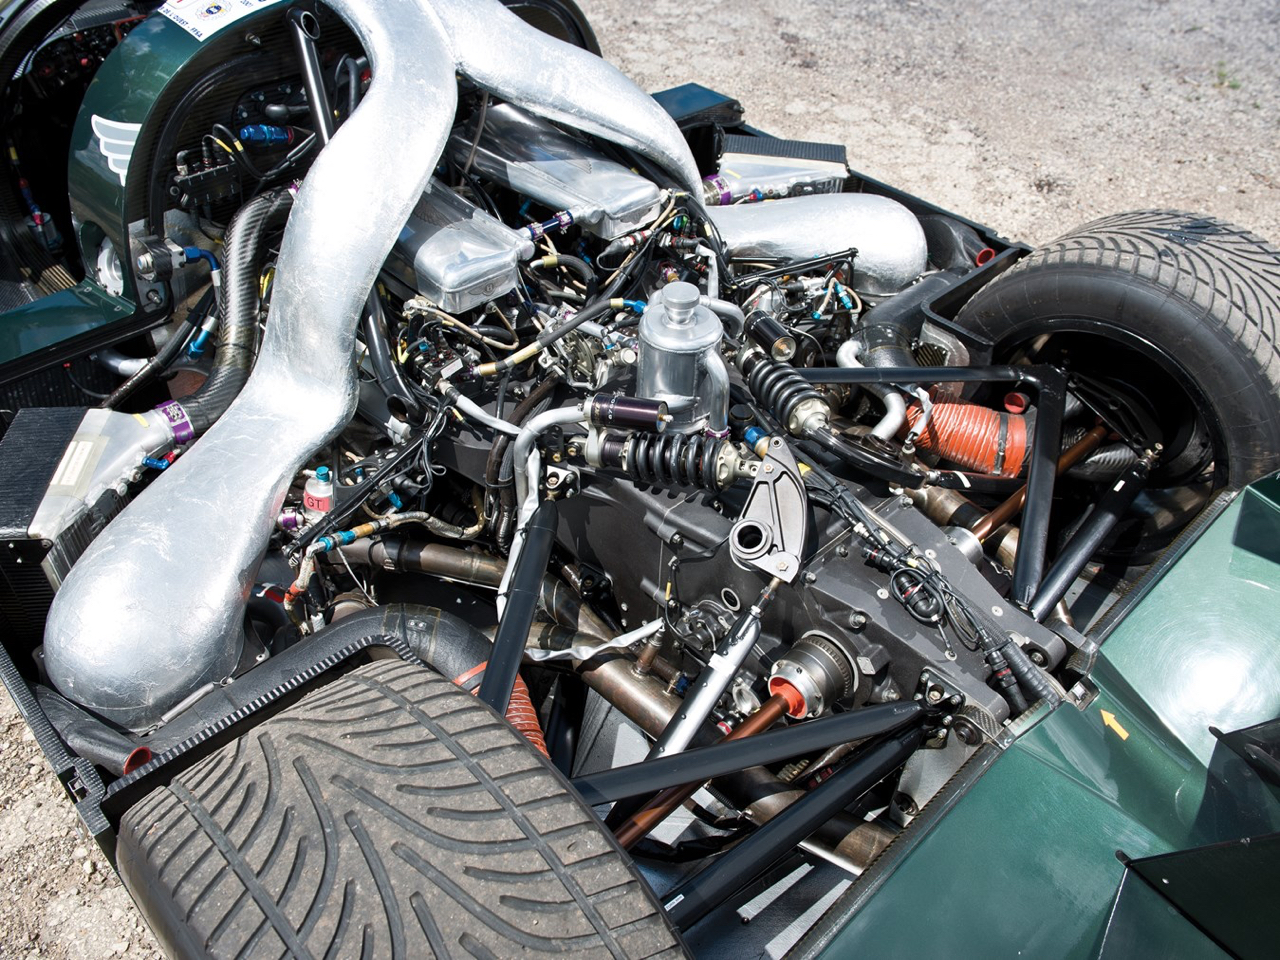 Engine Sound : Bentley Speed 8 - 3 années pour 1 victoire ! 46